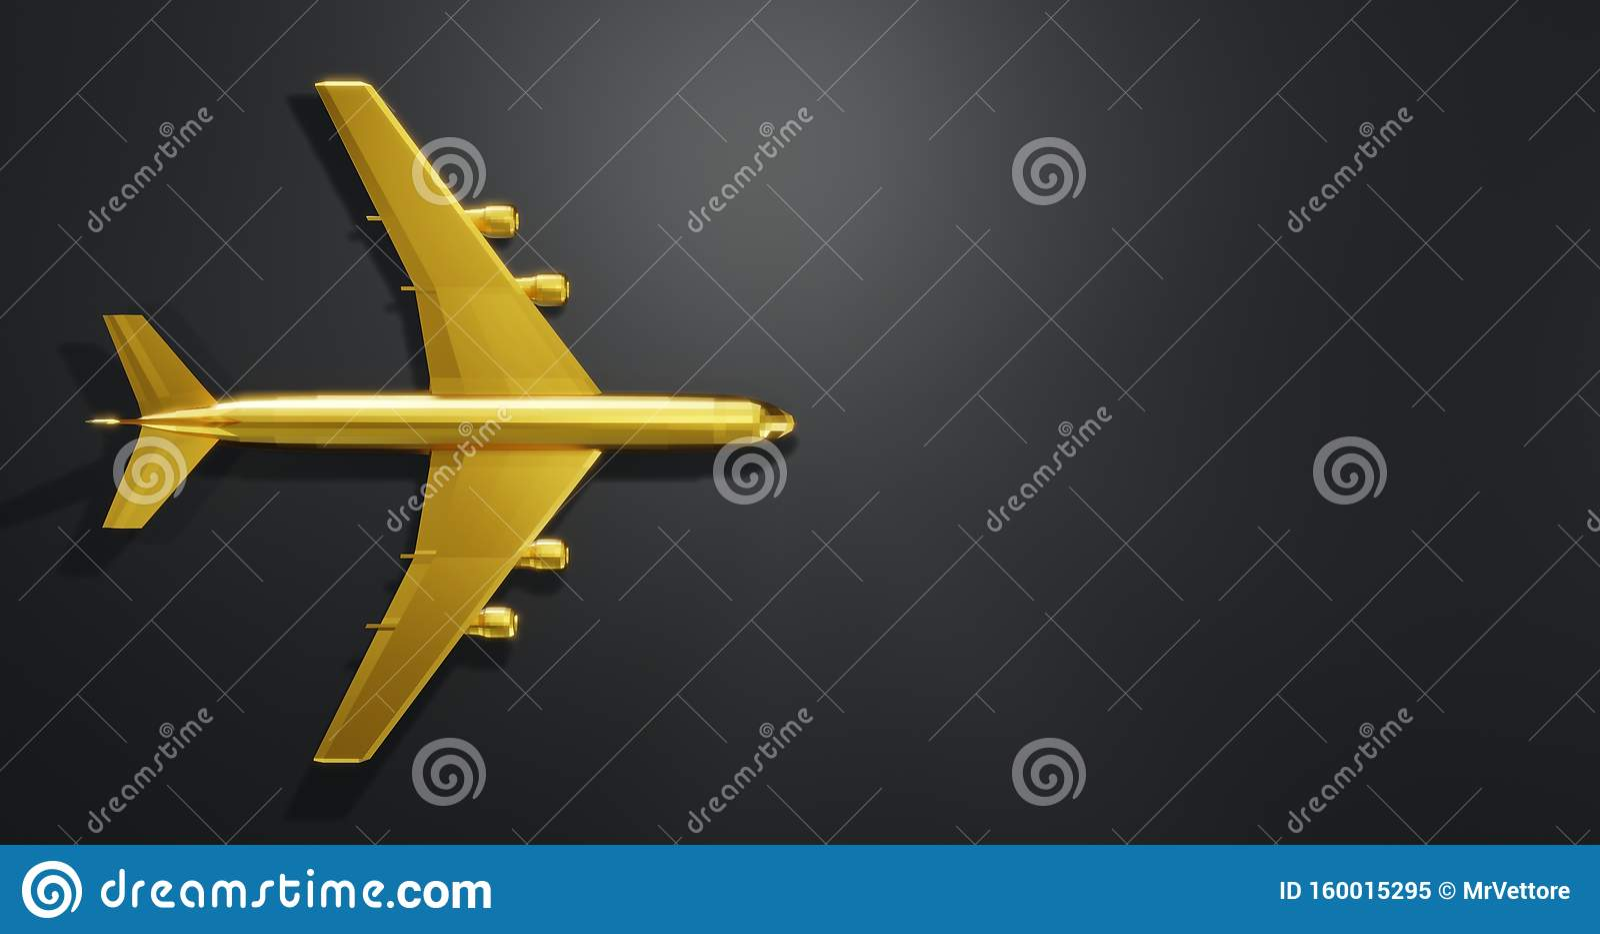 Magna-Tiles Idea: Jet Aircraft - YouTube